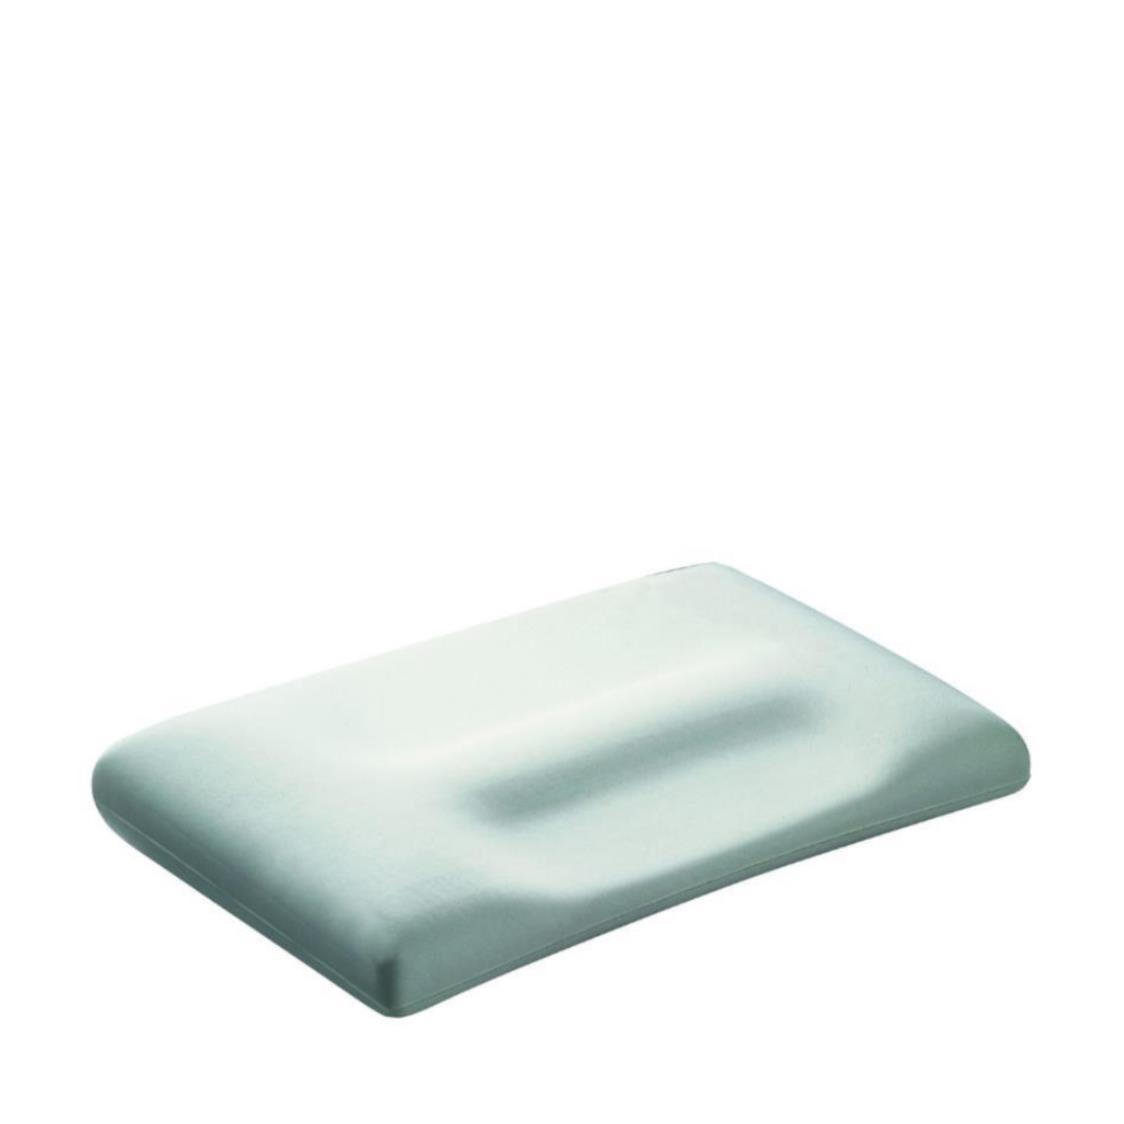 Dentons Therapeutic Pillow AntiSnore